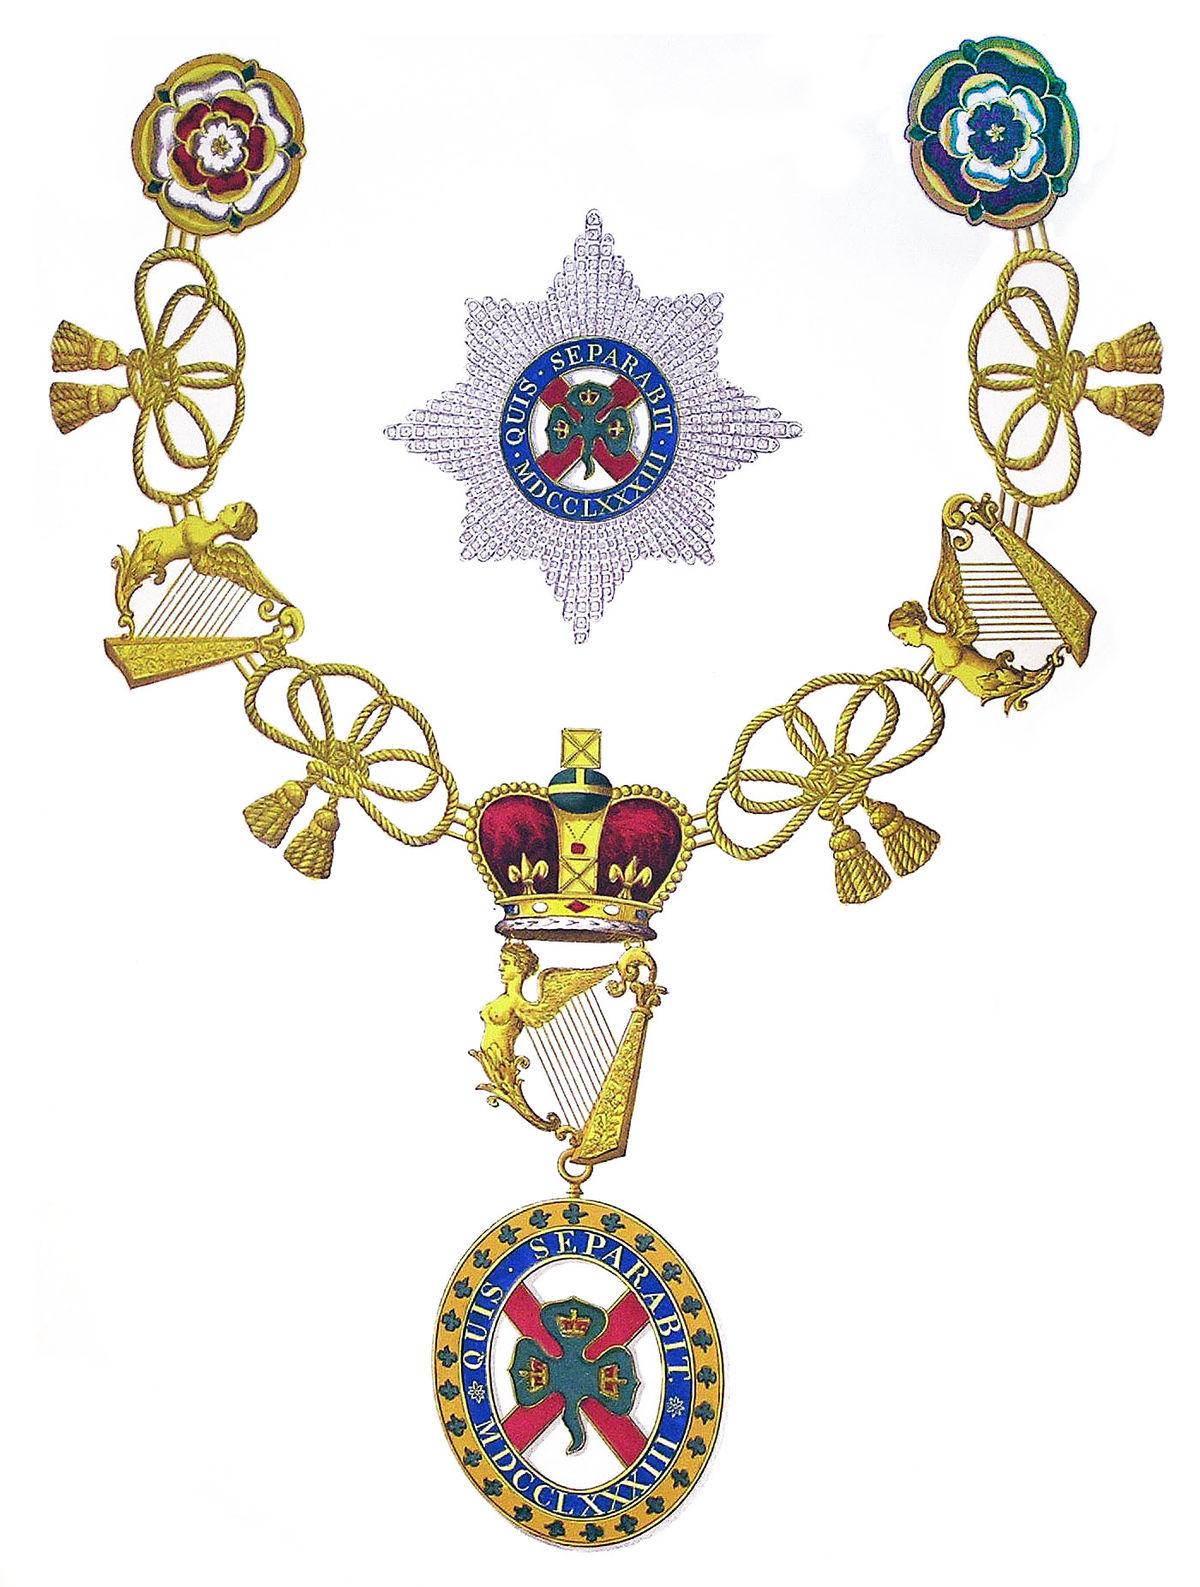 Order of Saint Patrick – Wikipedia